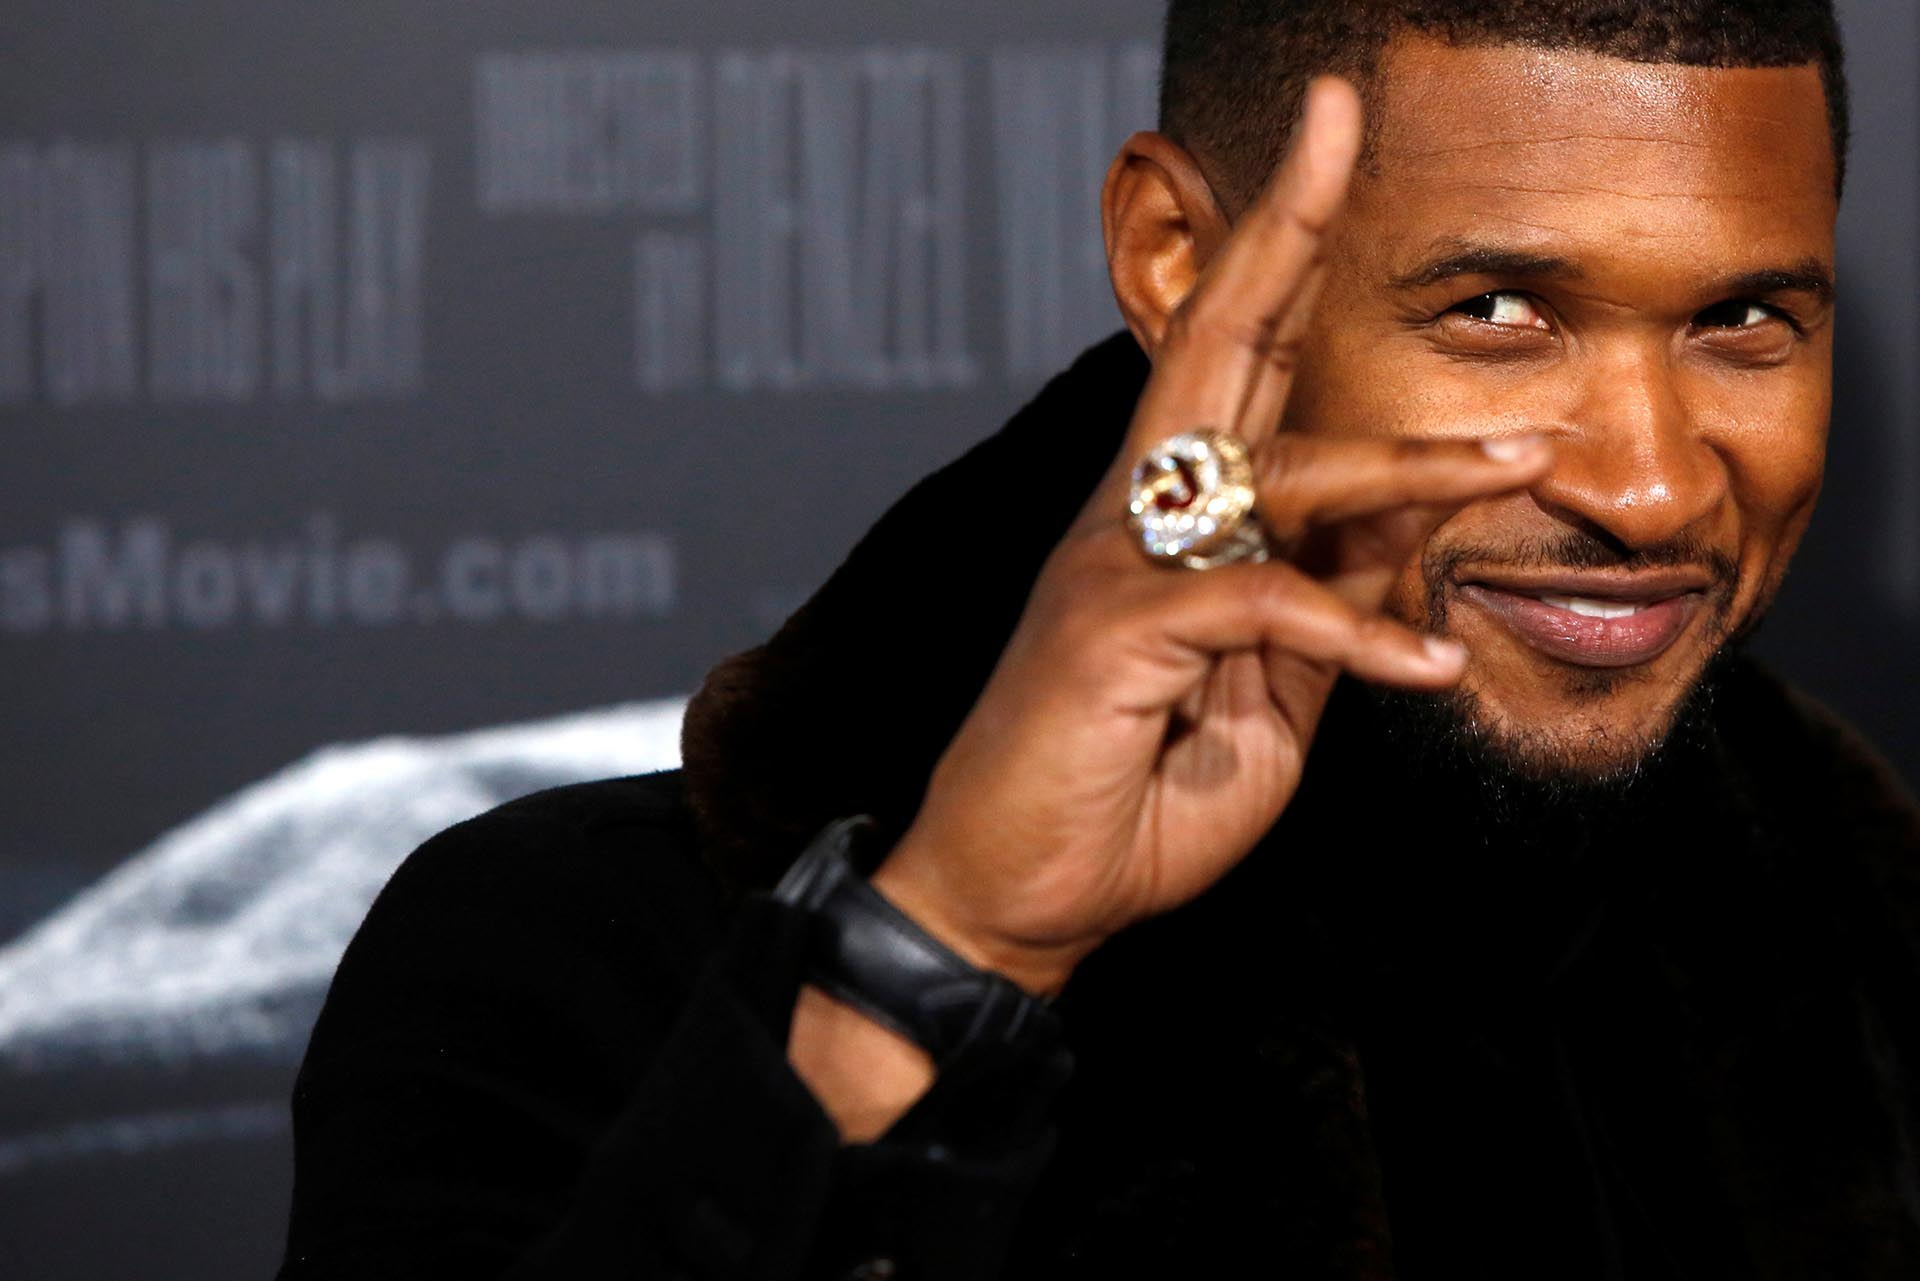 El músico Usher